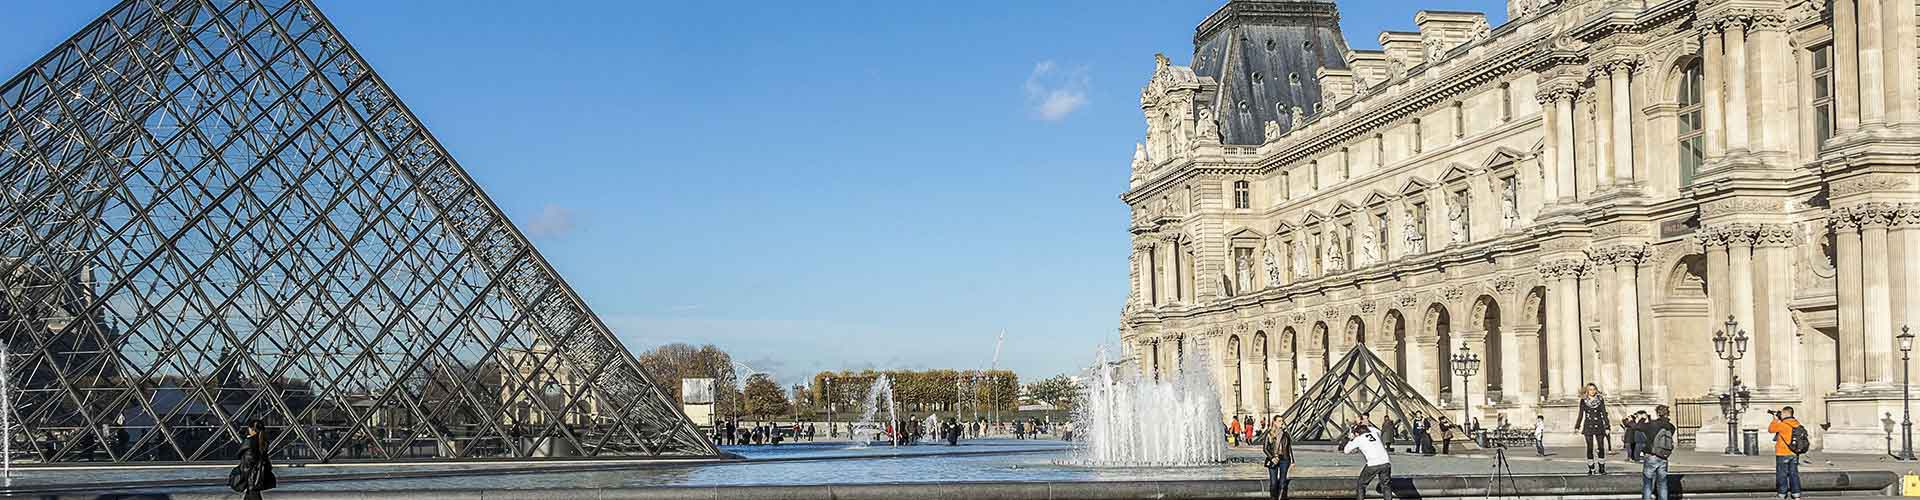 París - Albergues Juveniles cerca a Louvre. Mapas de París, Fotos y Comentarios para cada Albergue Juvenil en París.